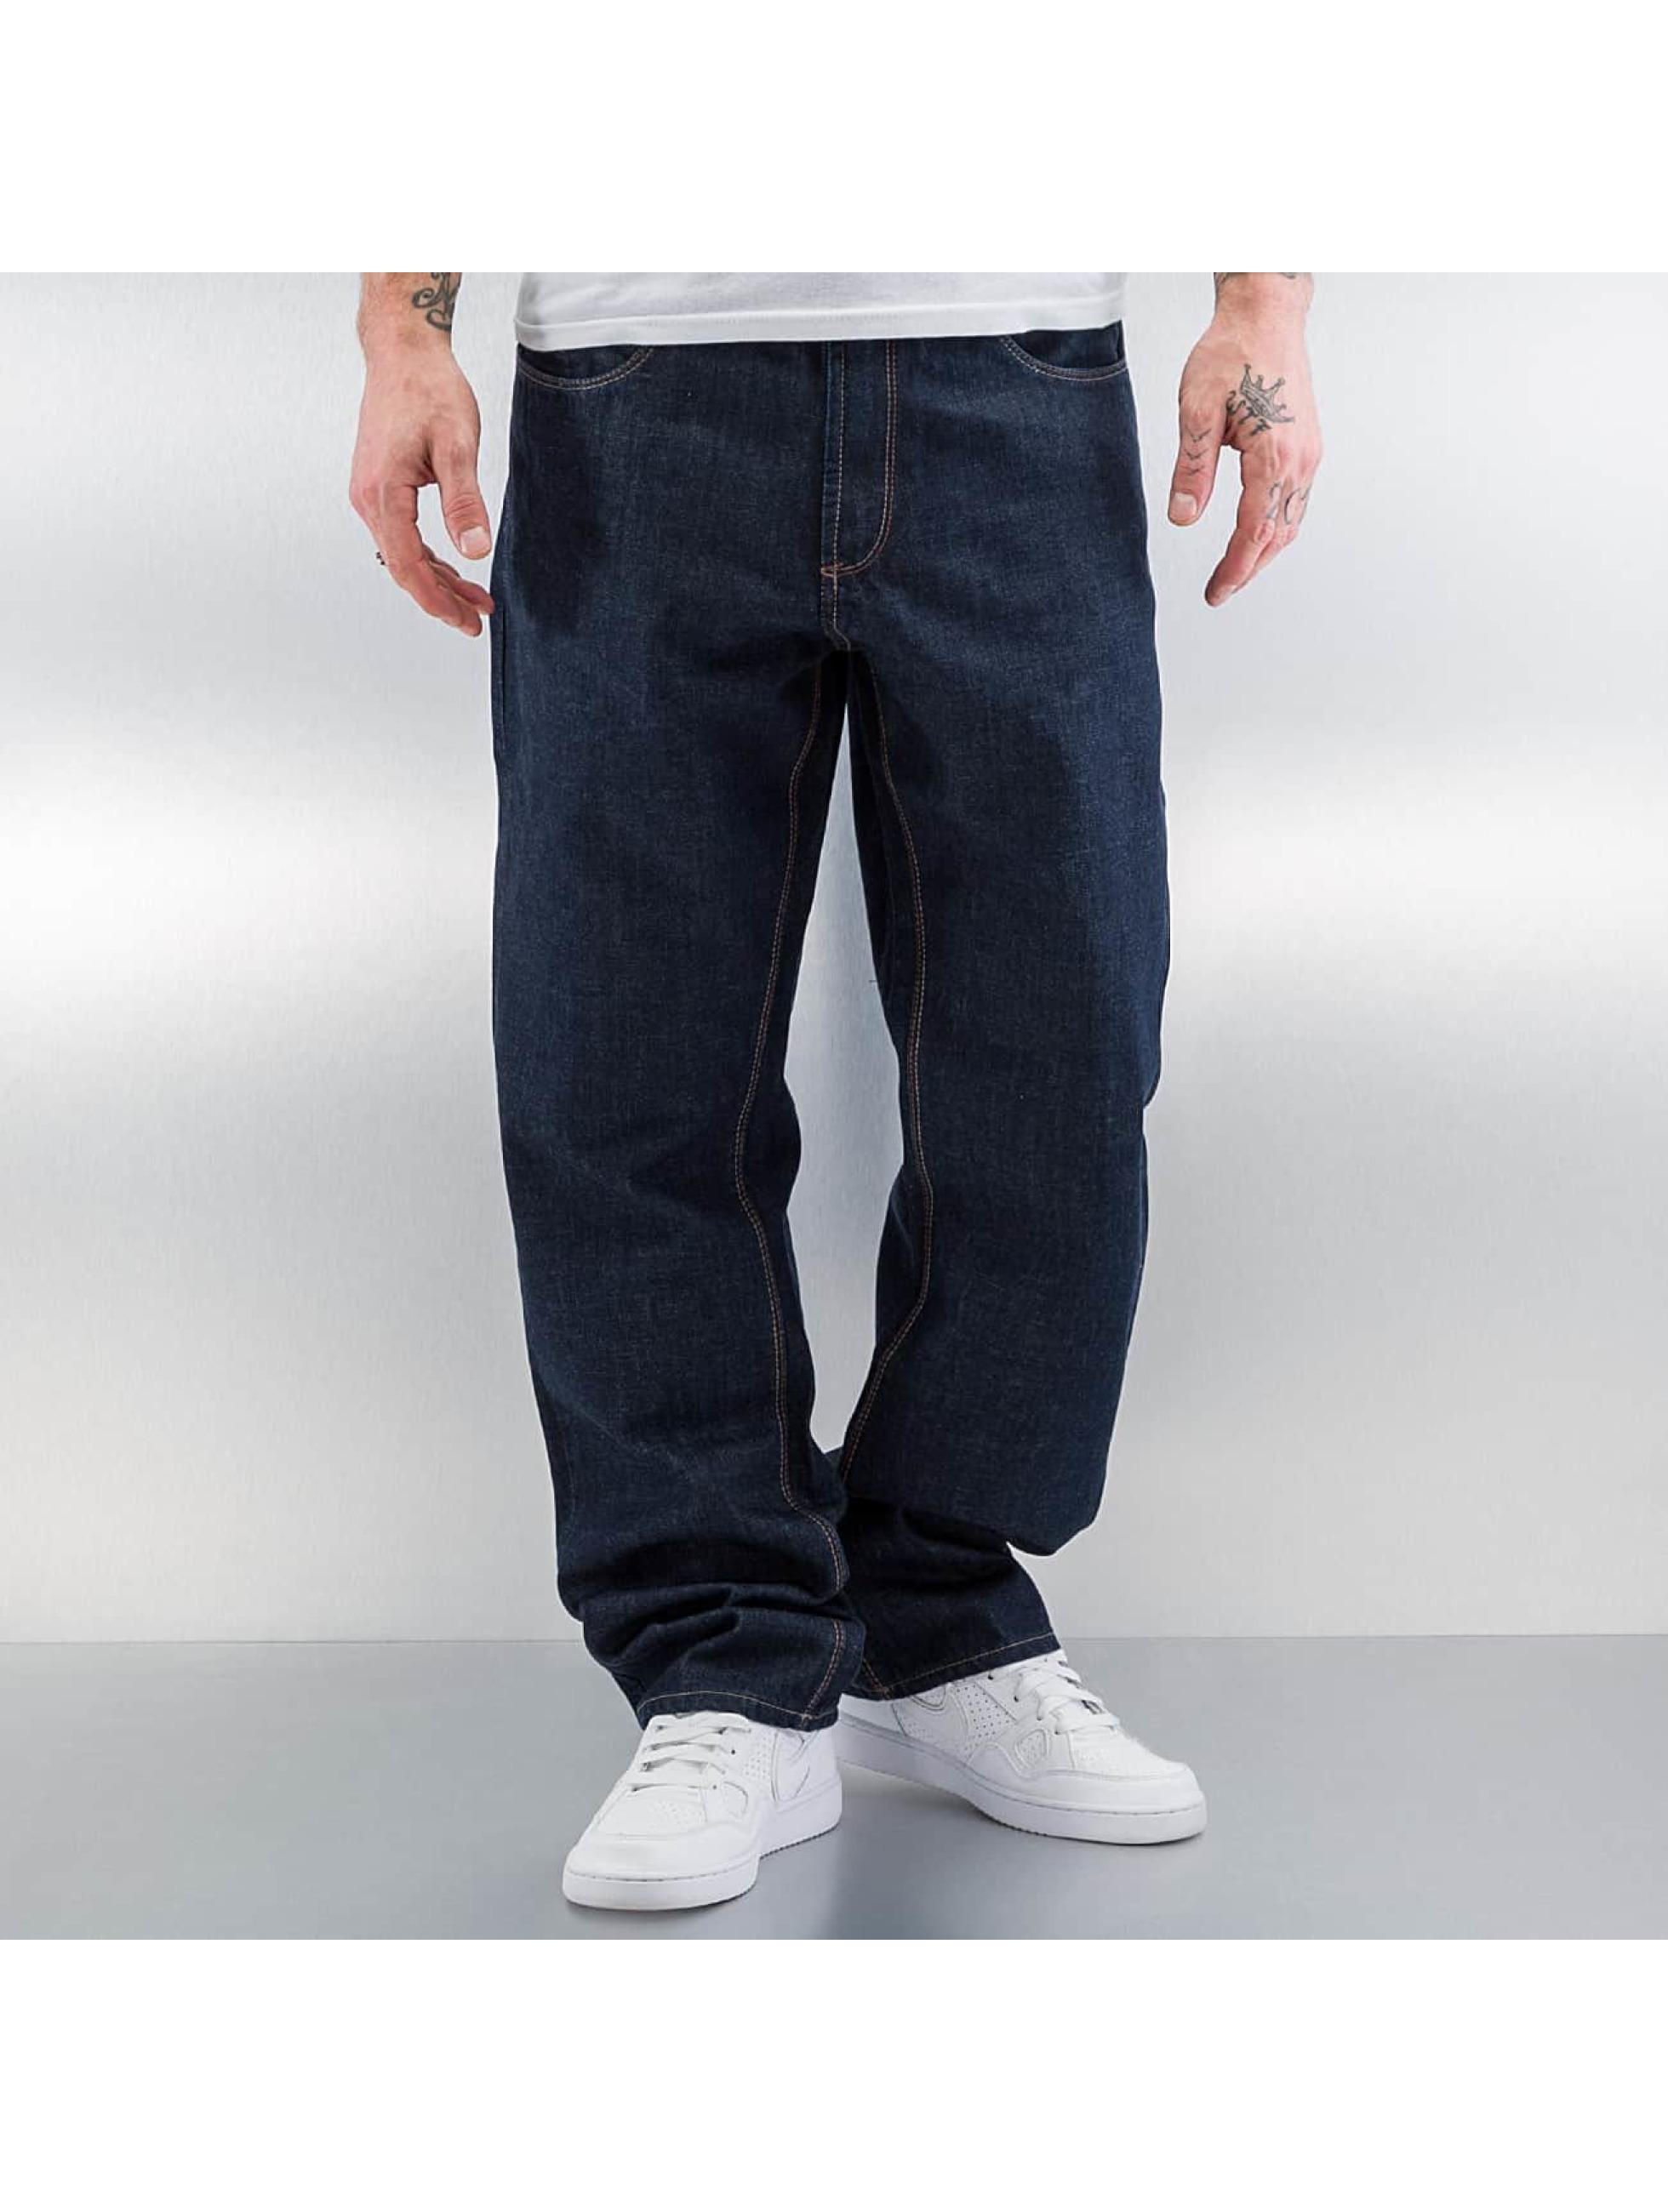 Reell Jeans Брюки Baggy Drifter синий